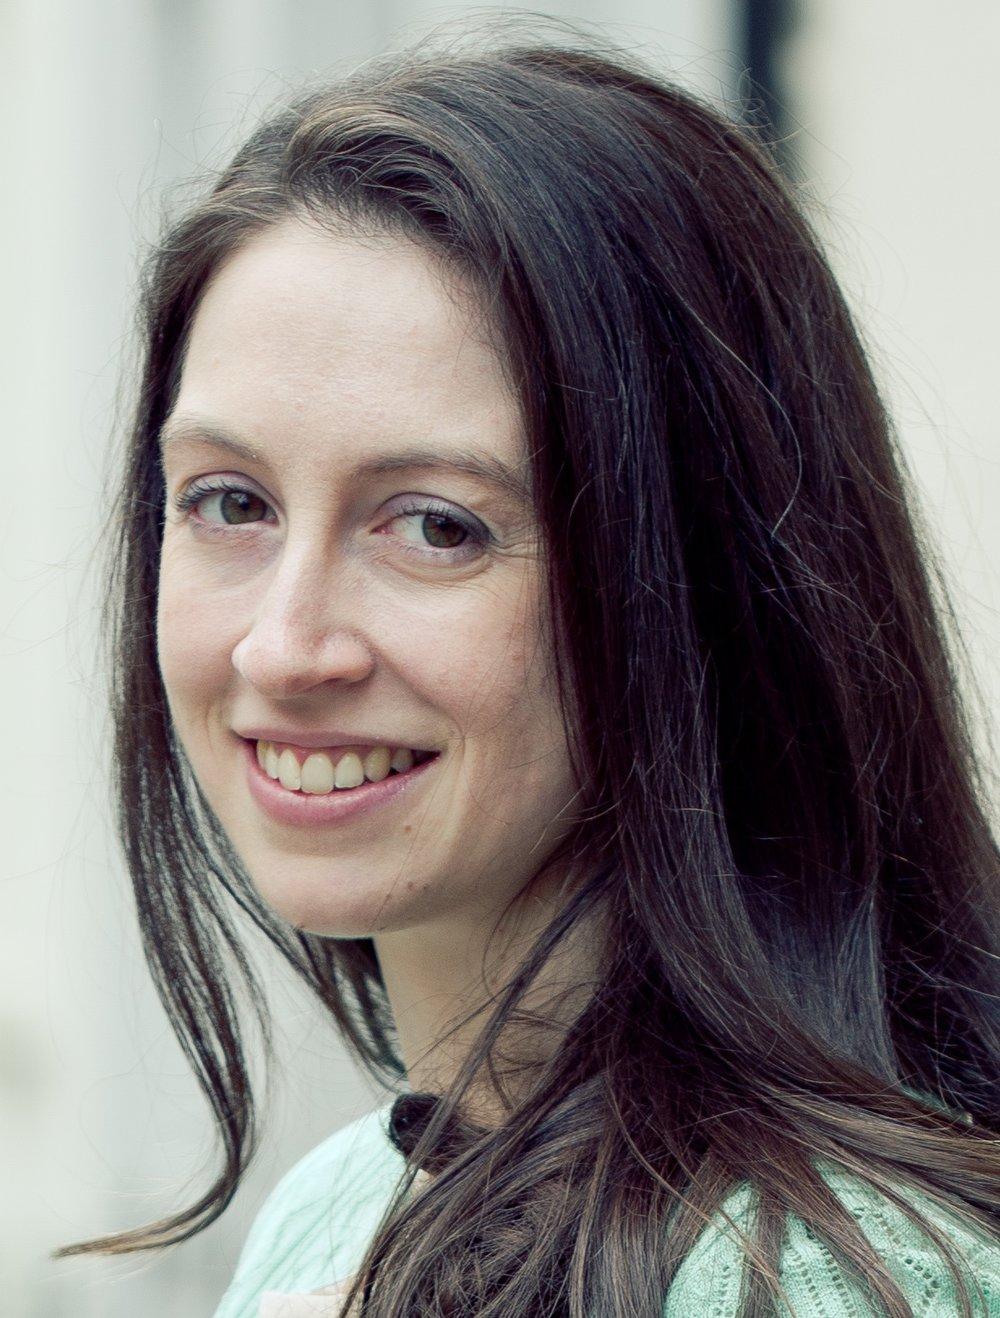 KatharineleRoux.jpg